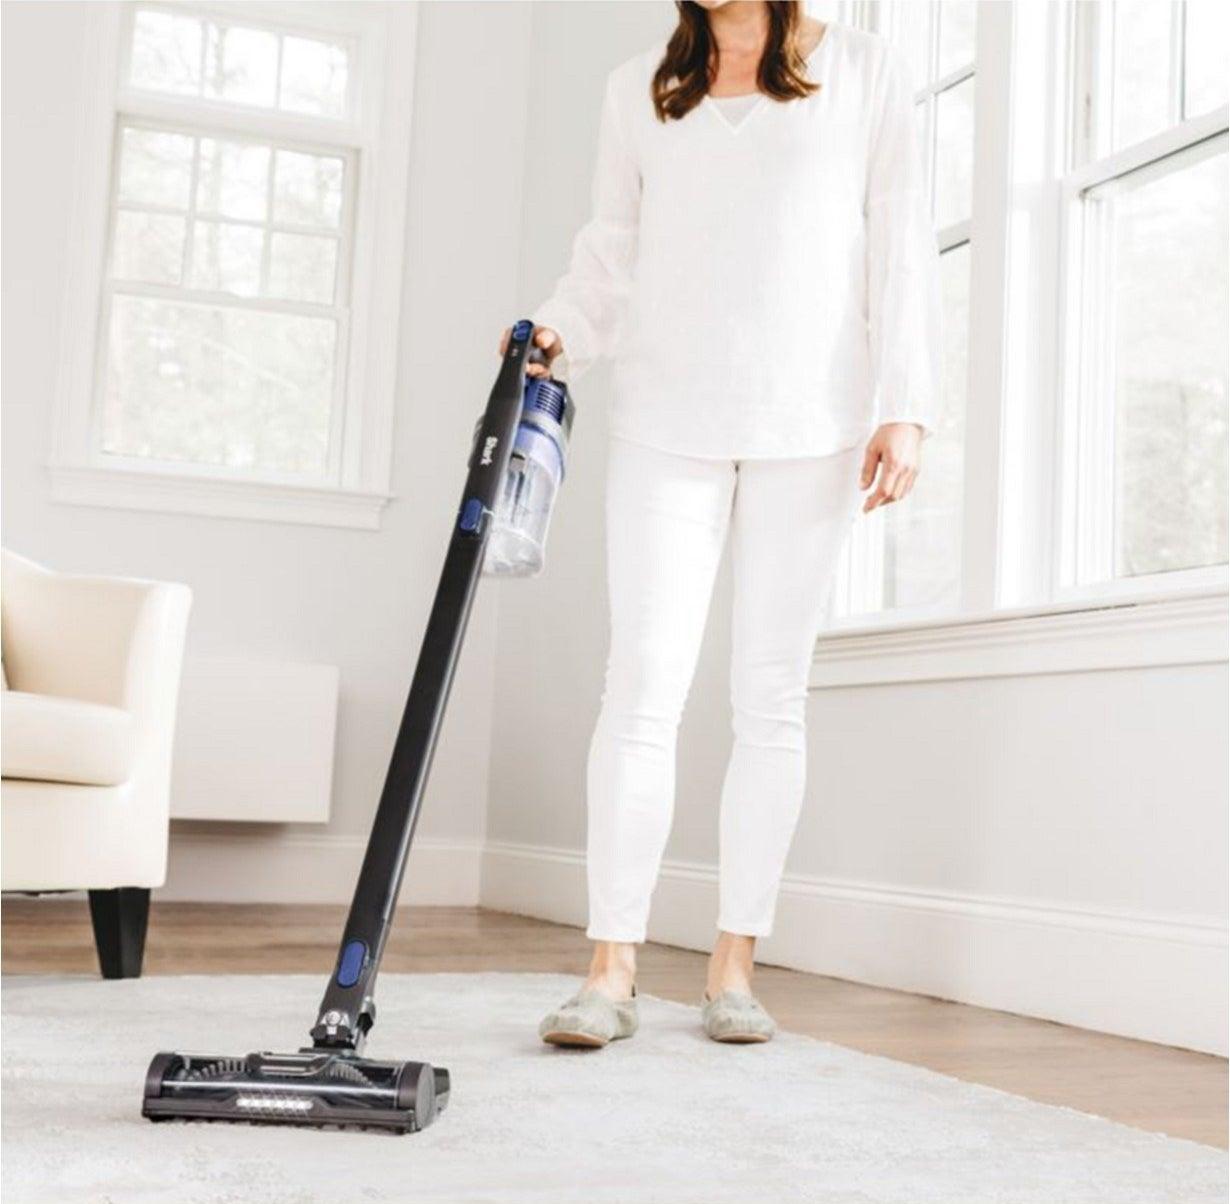 A model using the stick vacuum vacuum on a carpet